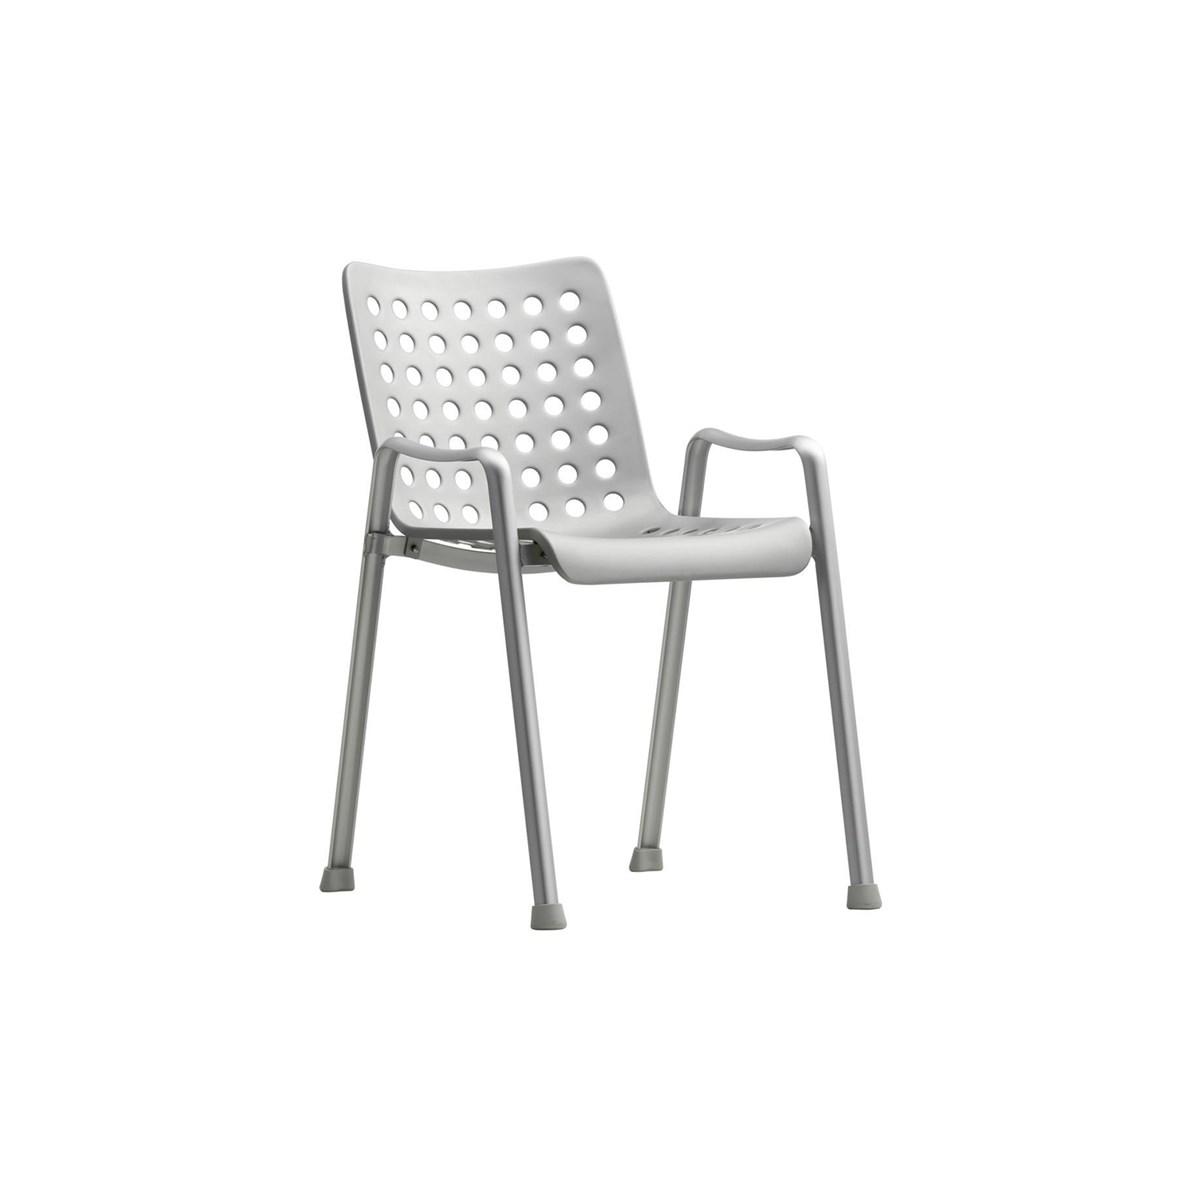 Vitra-Hans-Coray-Landi-Chair-Matisse-1